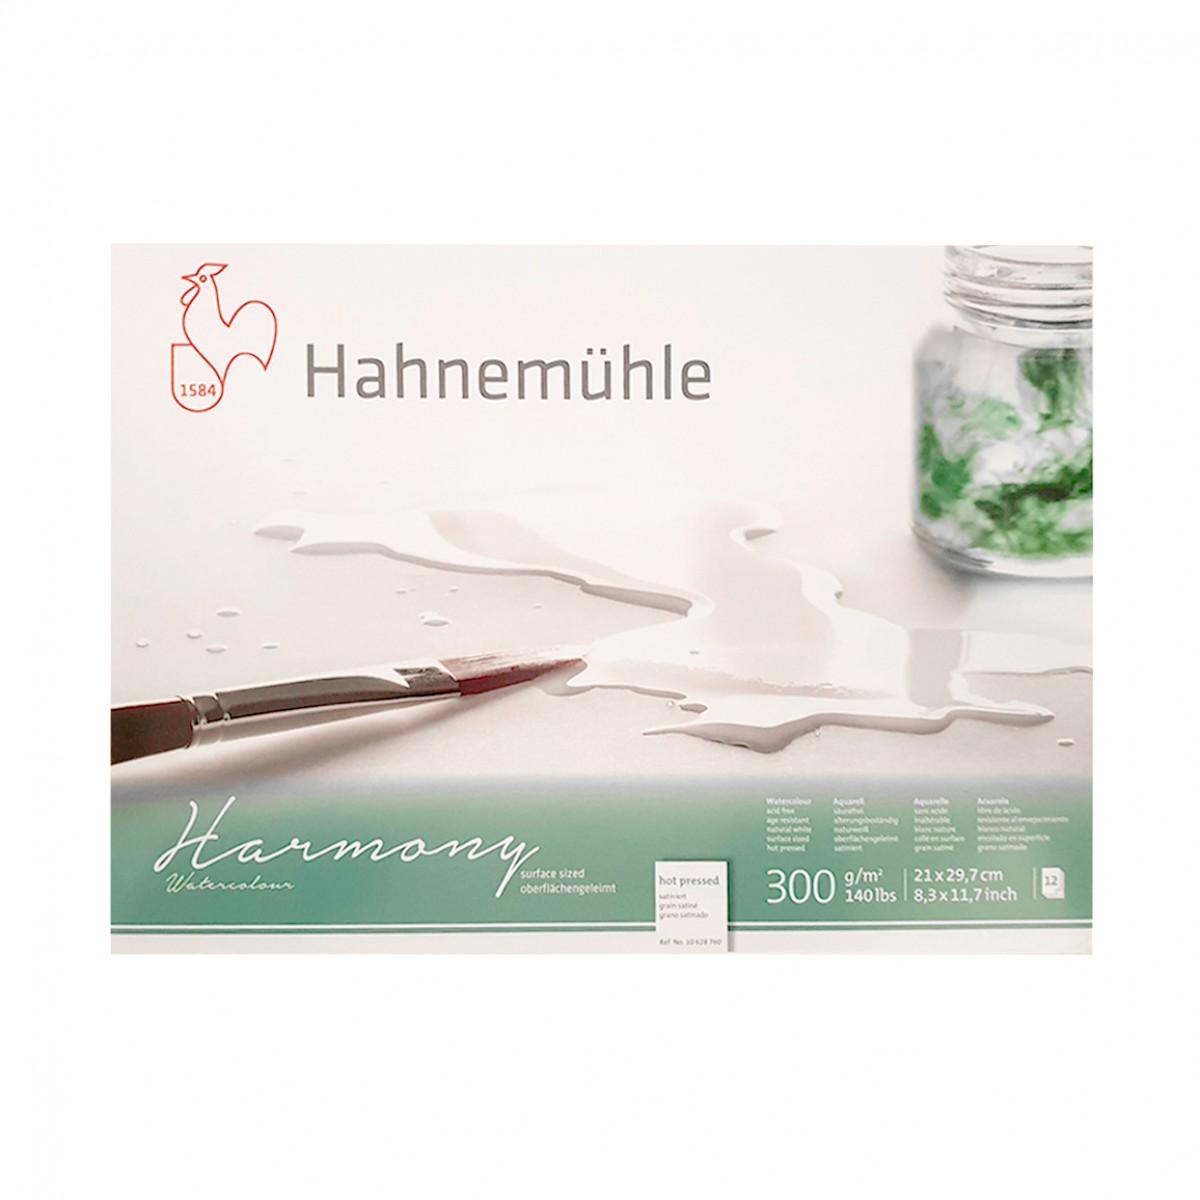 Hahnemühle Harmony Akvarel blok, Hot pressed, A3, 300gr.